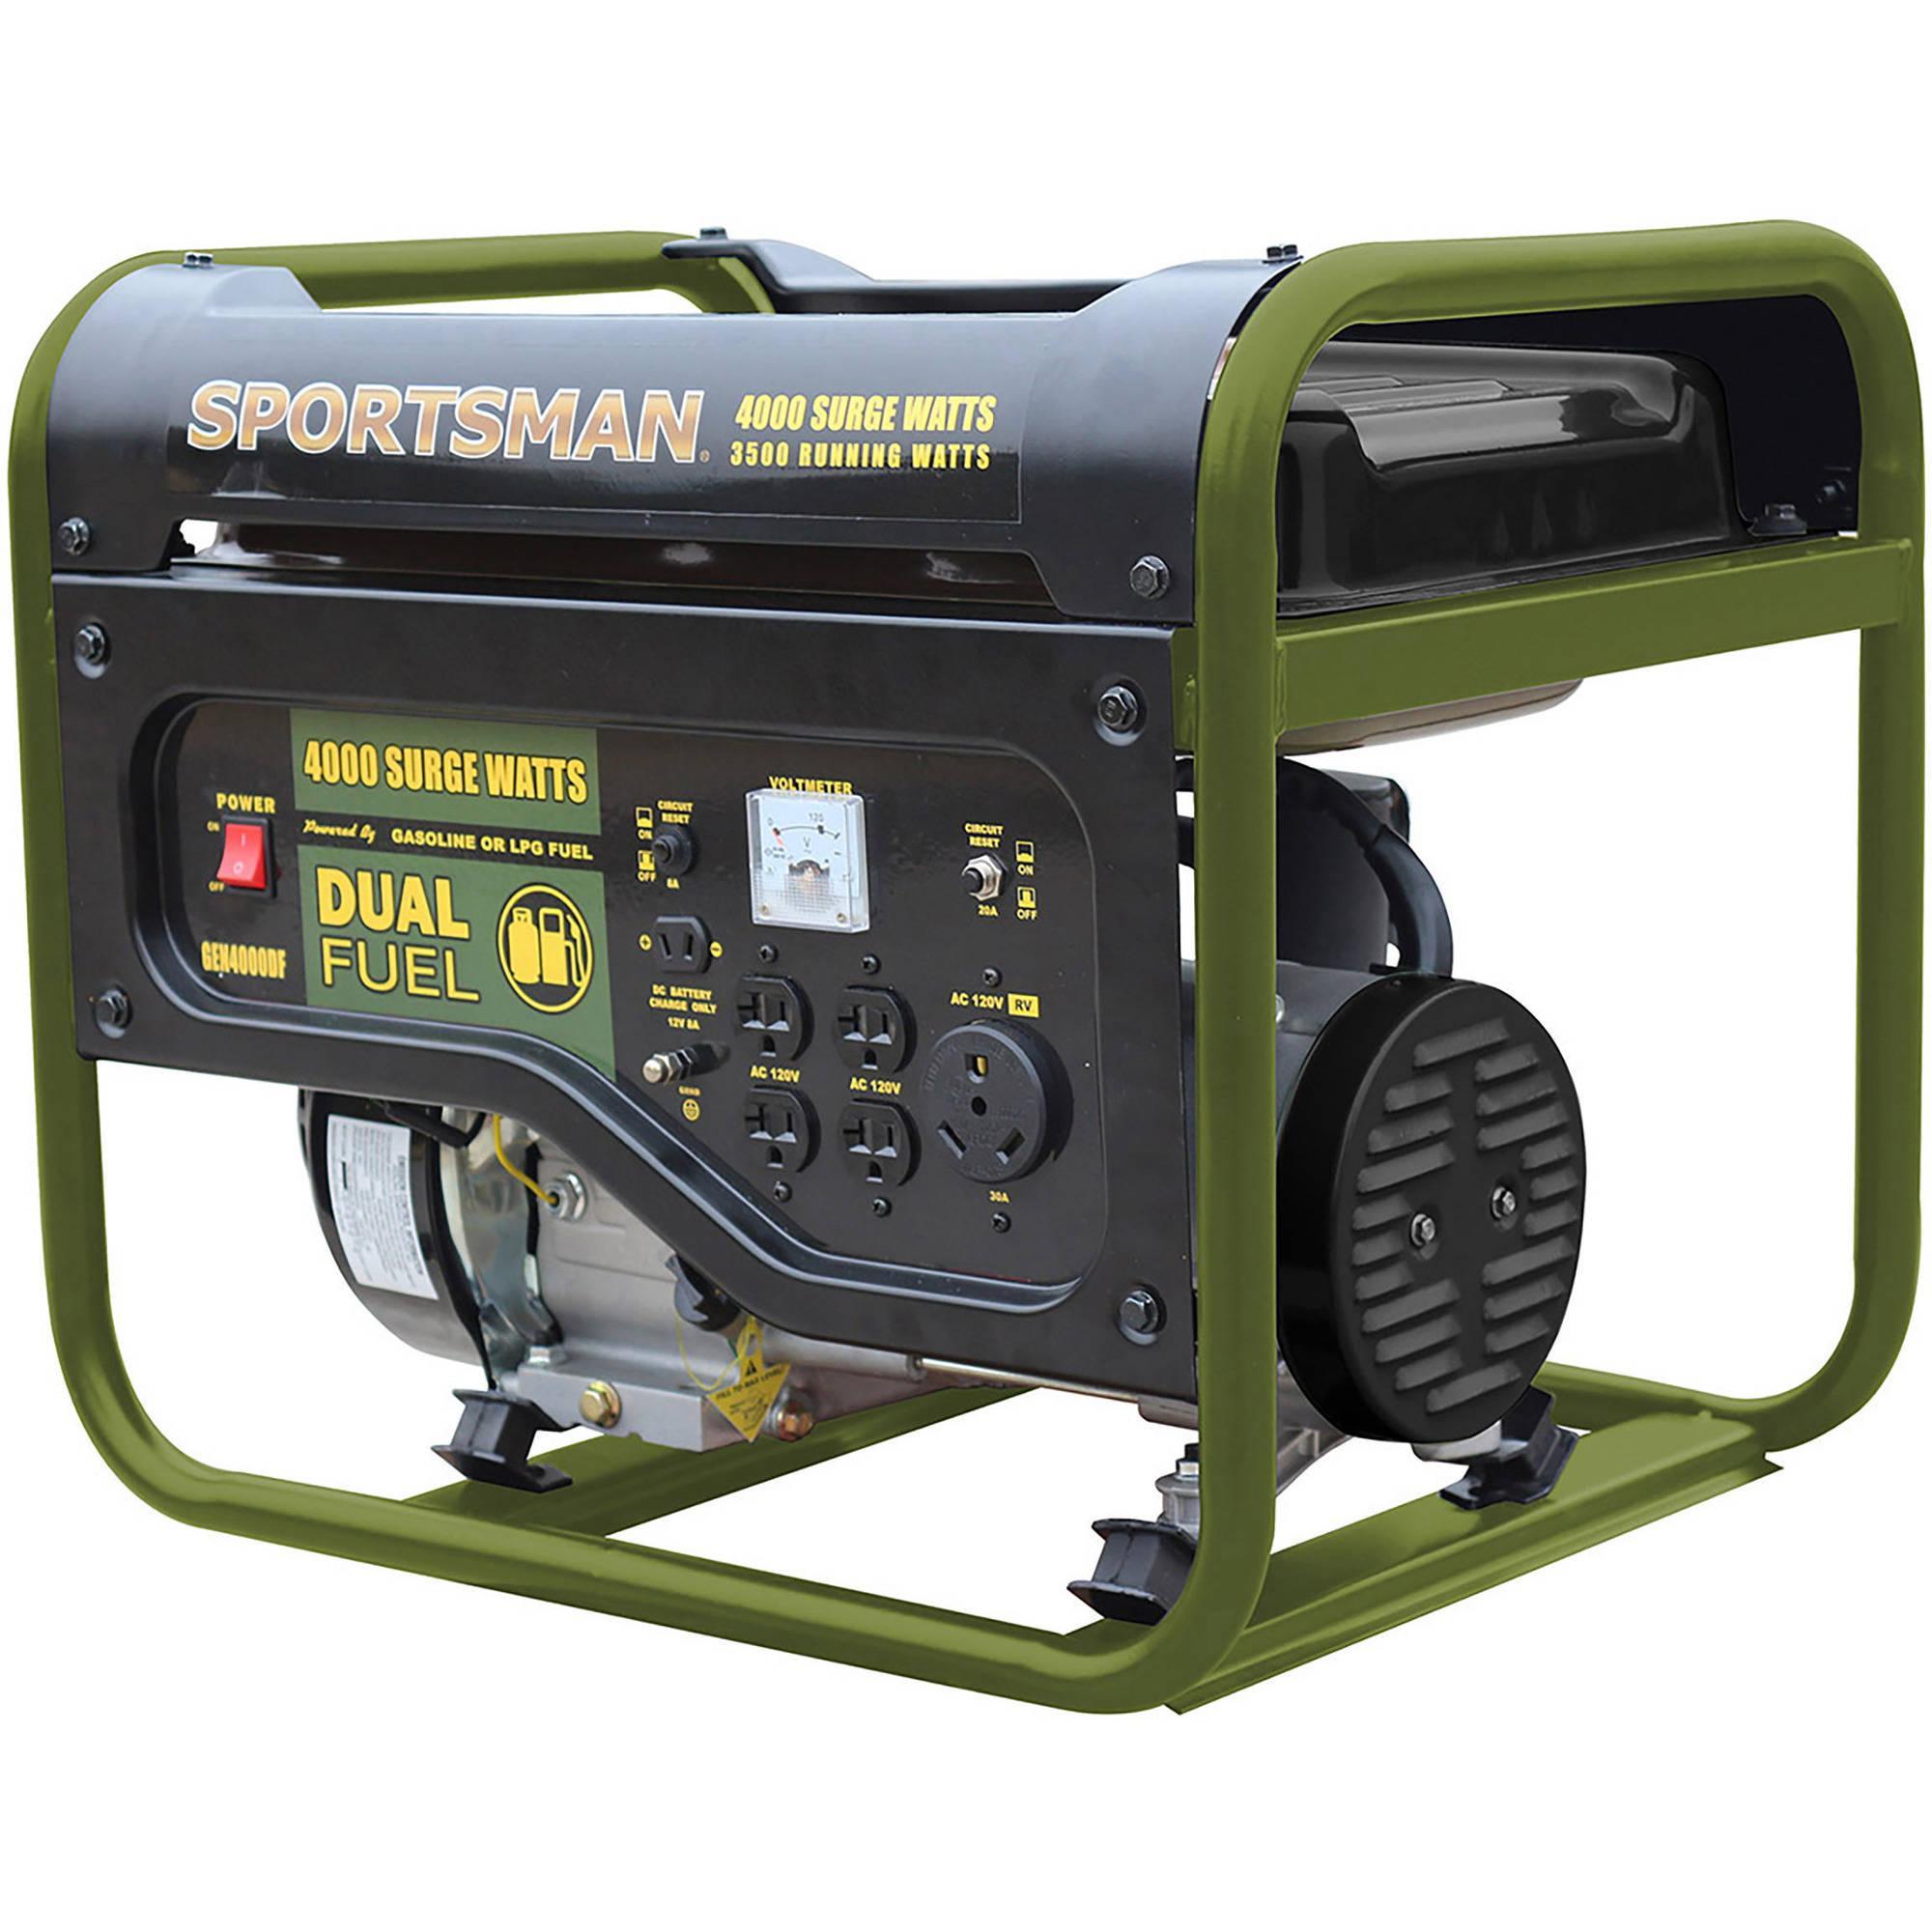 Sportsman GEN4000DF 4000W Dual Fuel Powered Portable Generator  $230 + Free Shipping